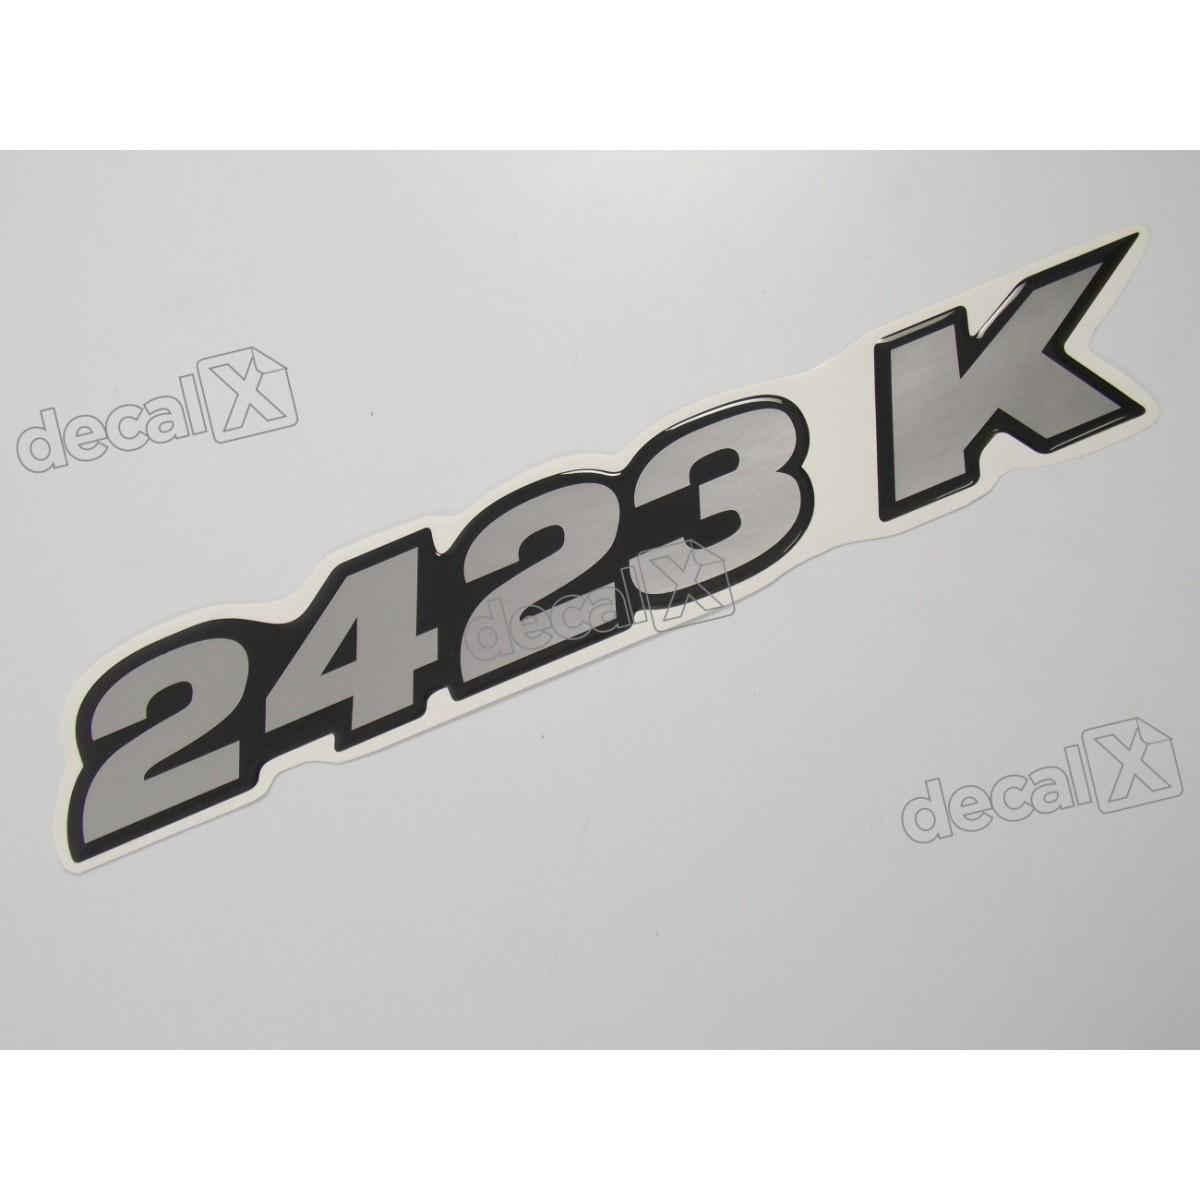 Adesivo Emblema Resinado Mercedes 2423 K Cm86 Decalx